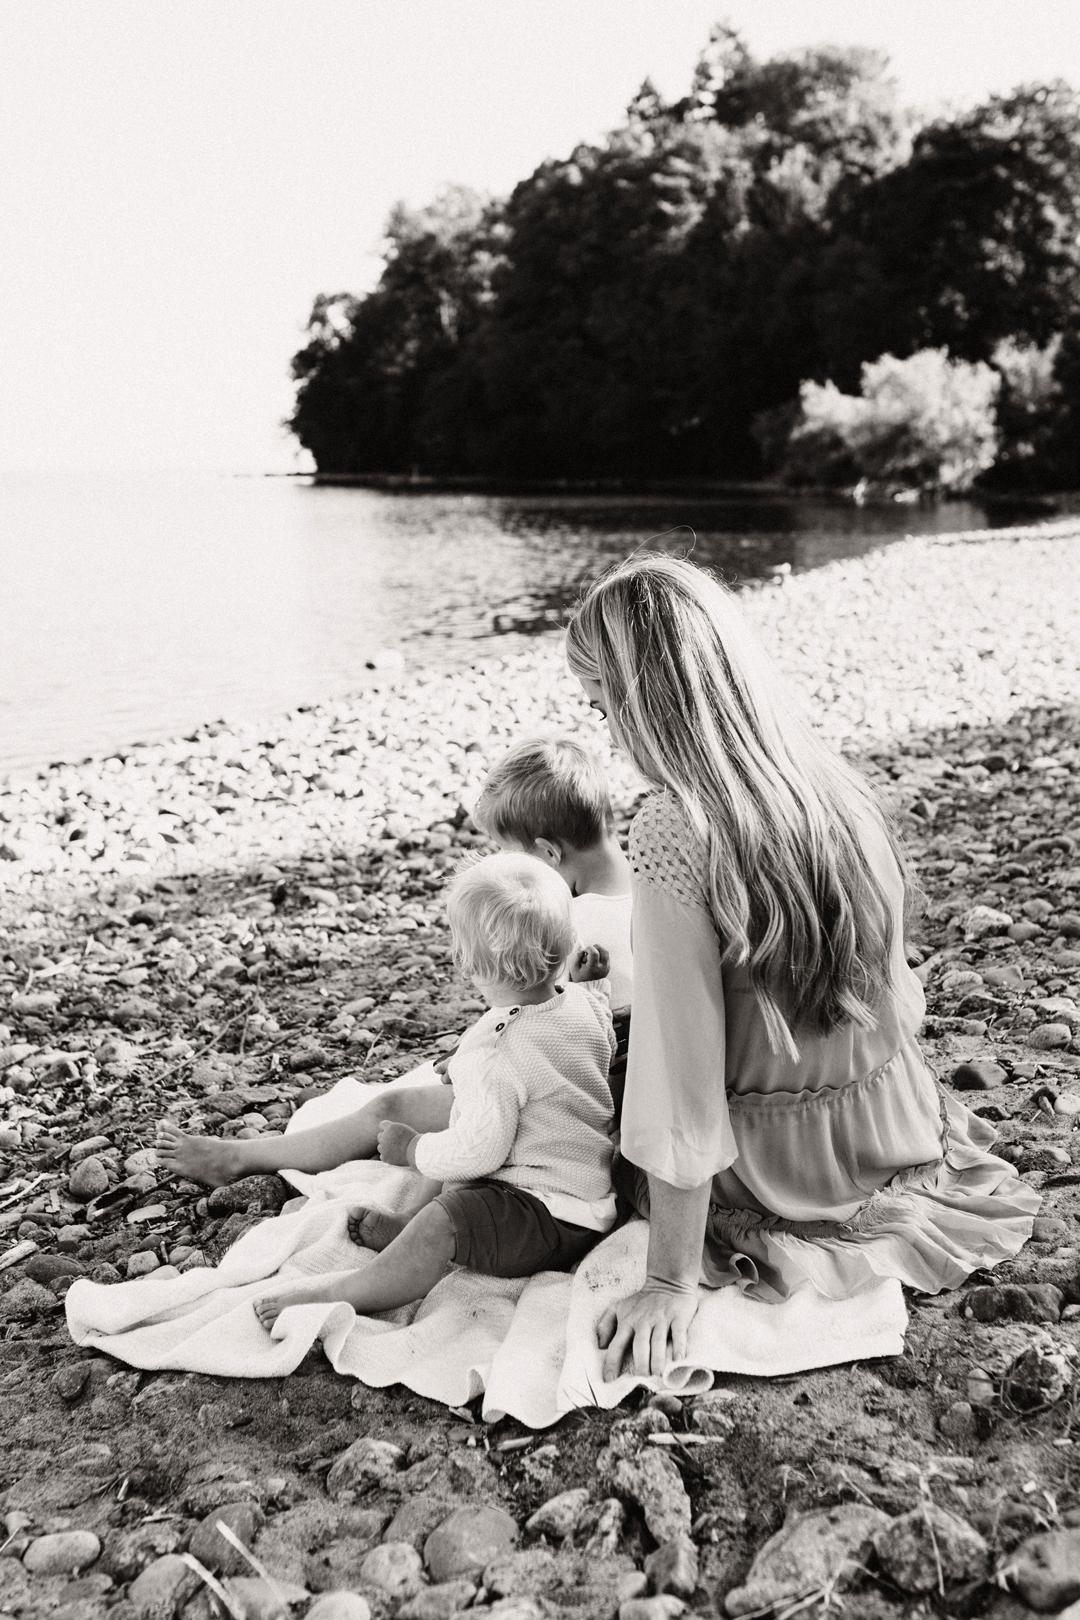 fotografera-barn-iphone-muta.jpg